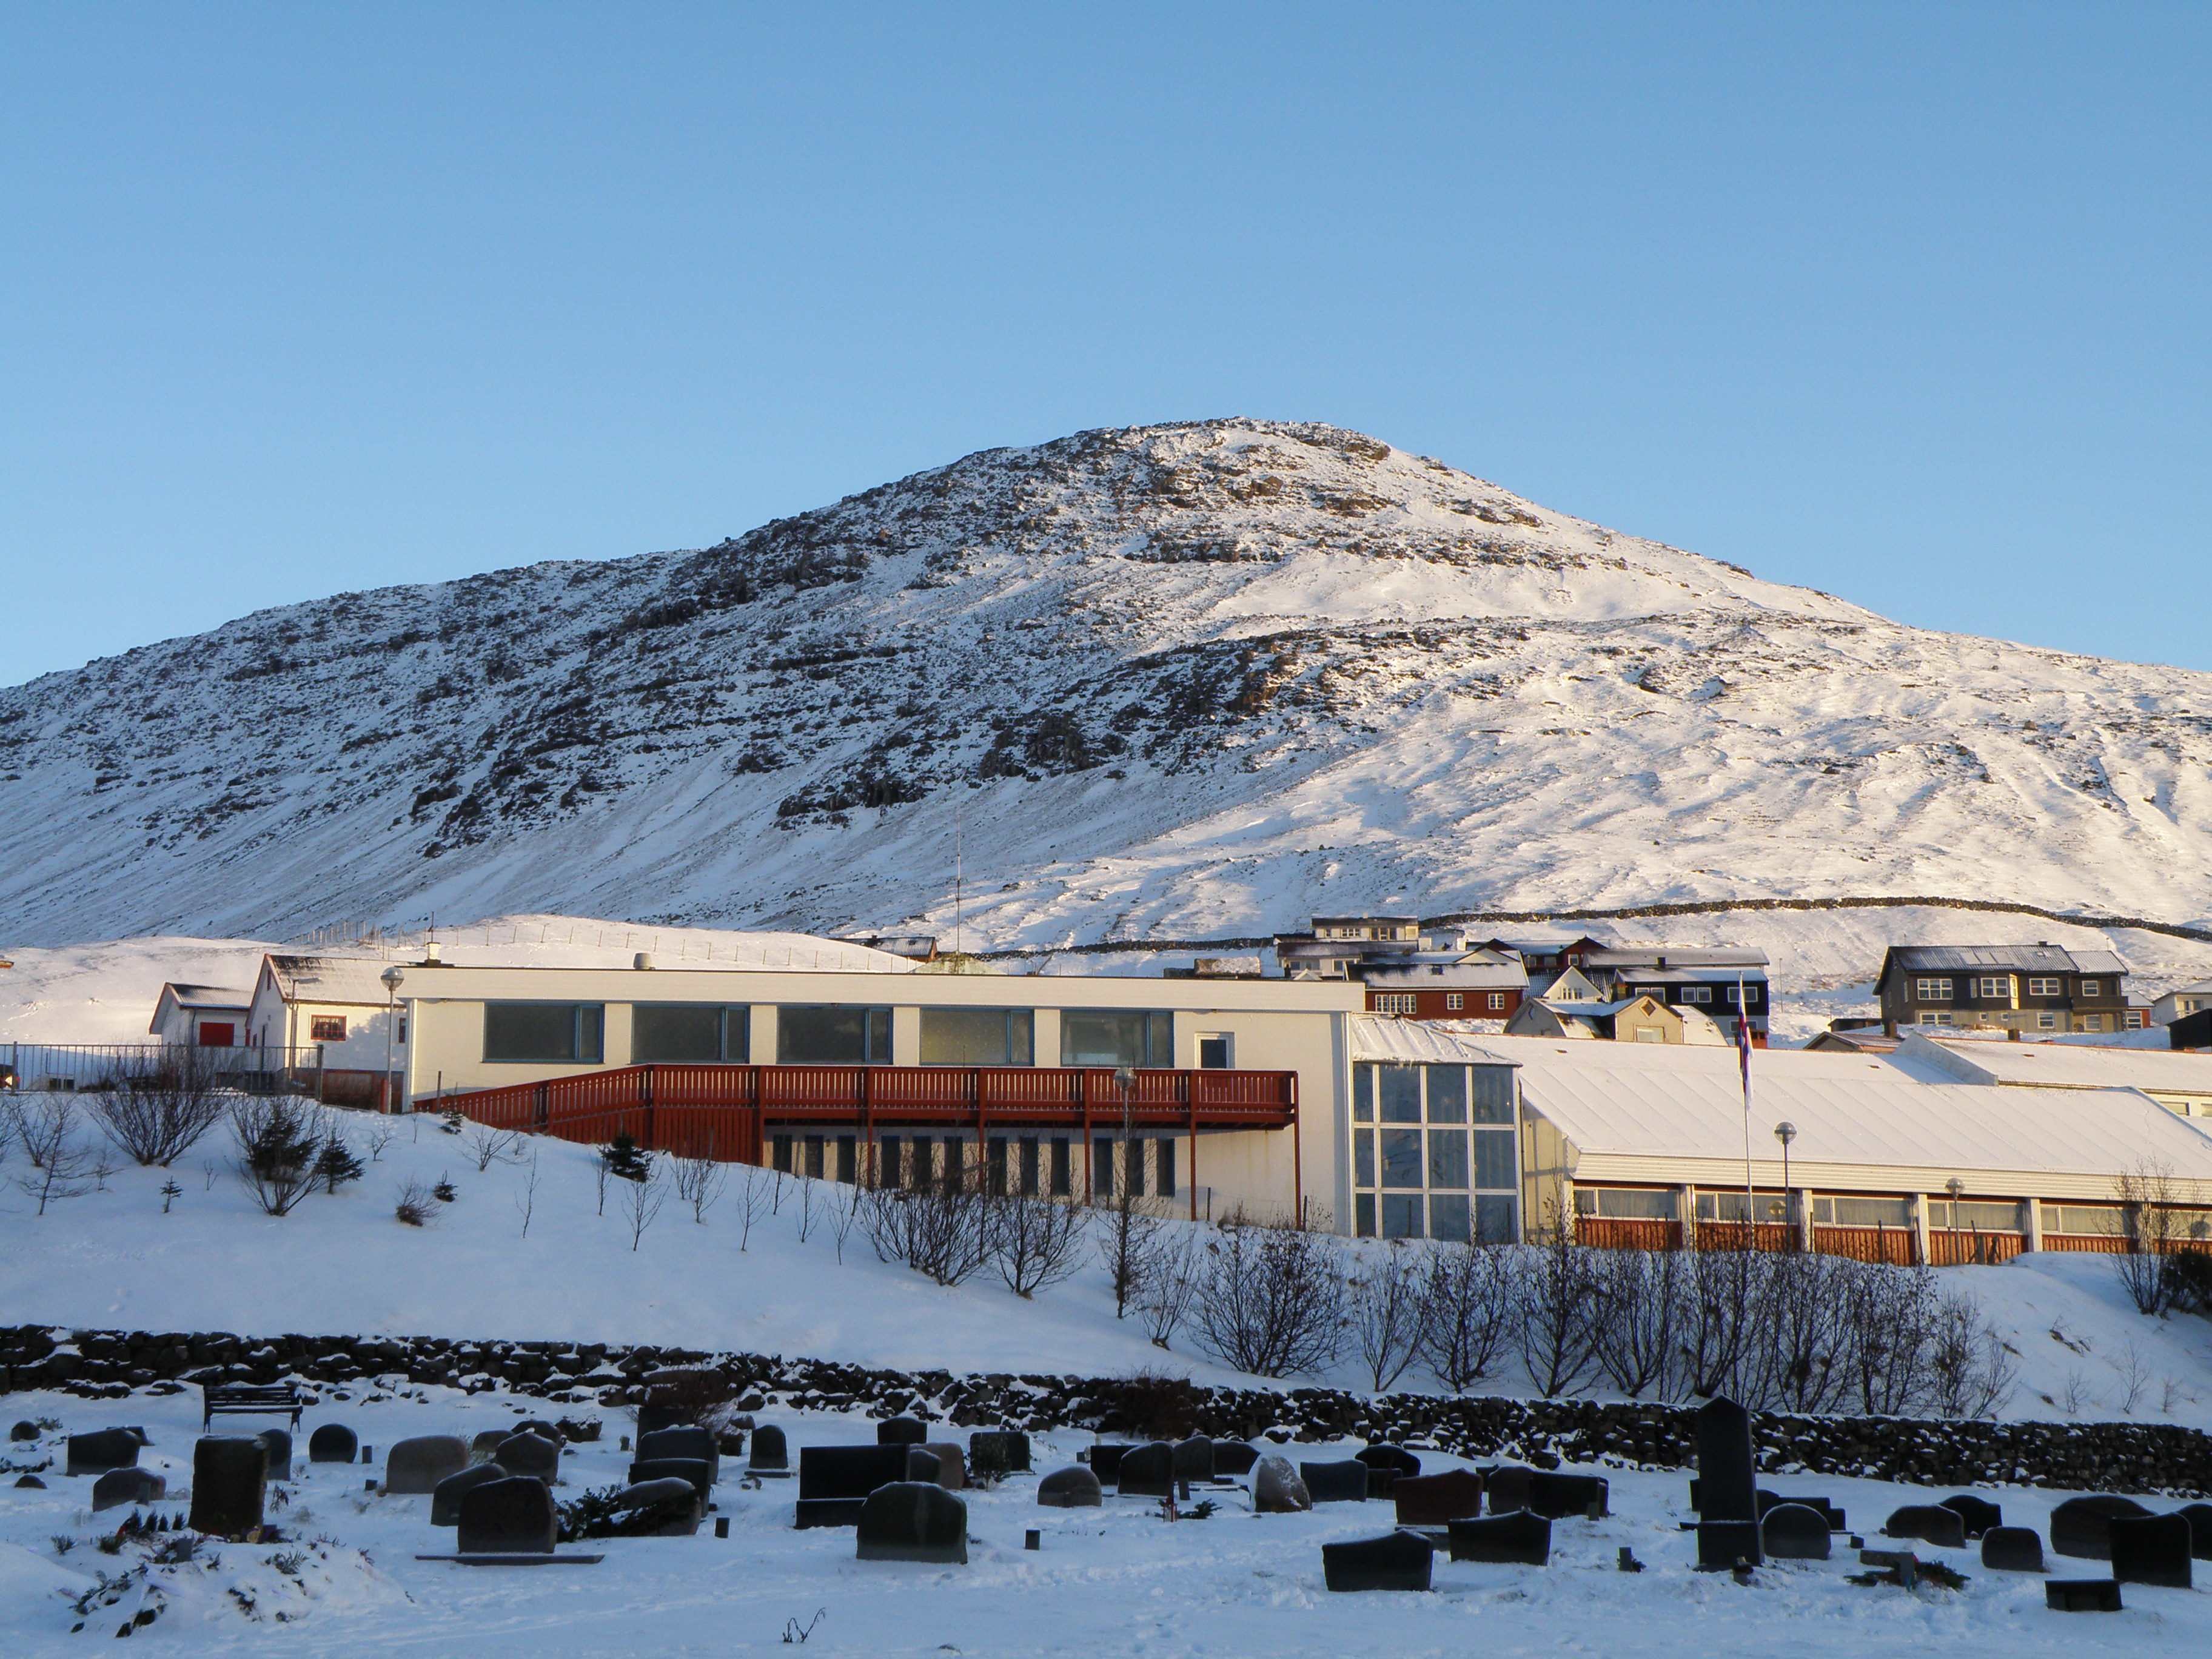 Islands Central School